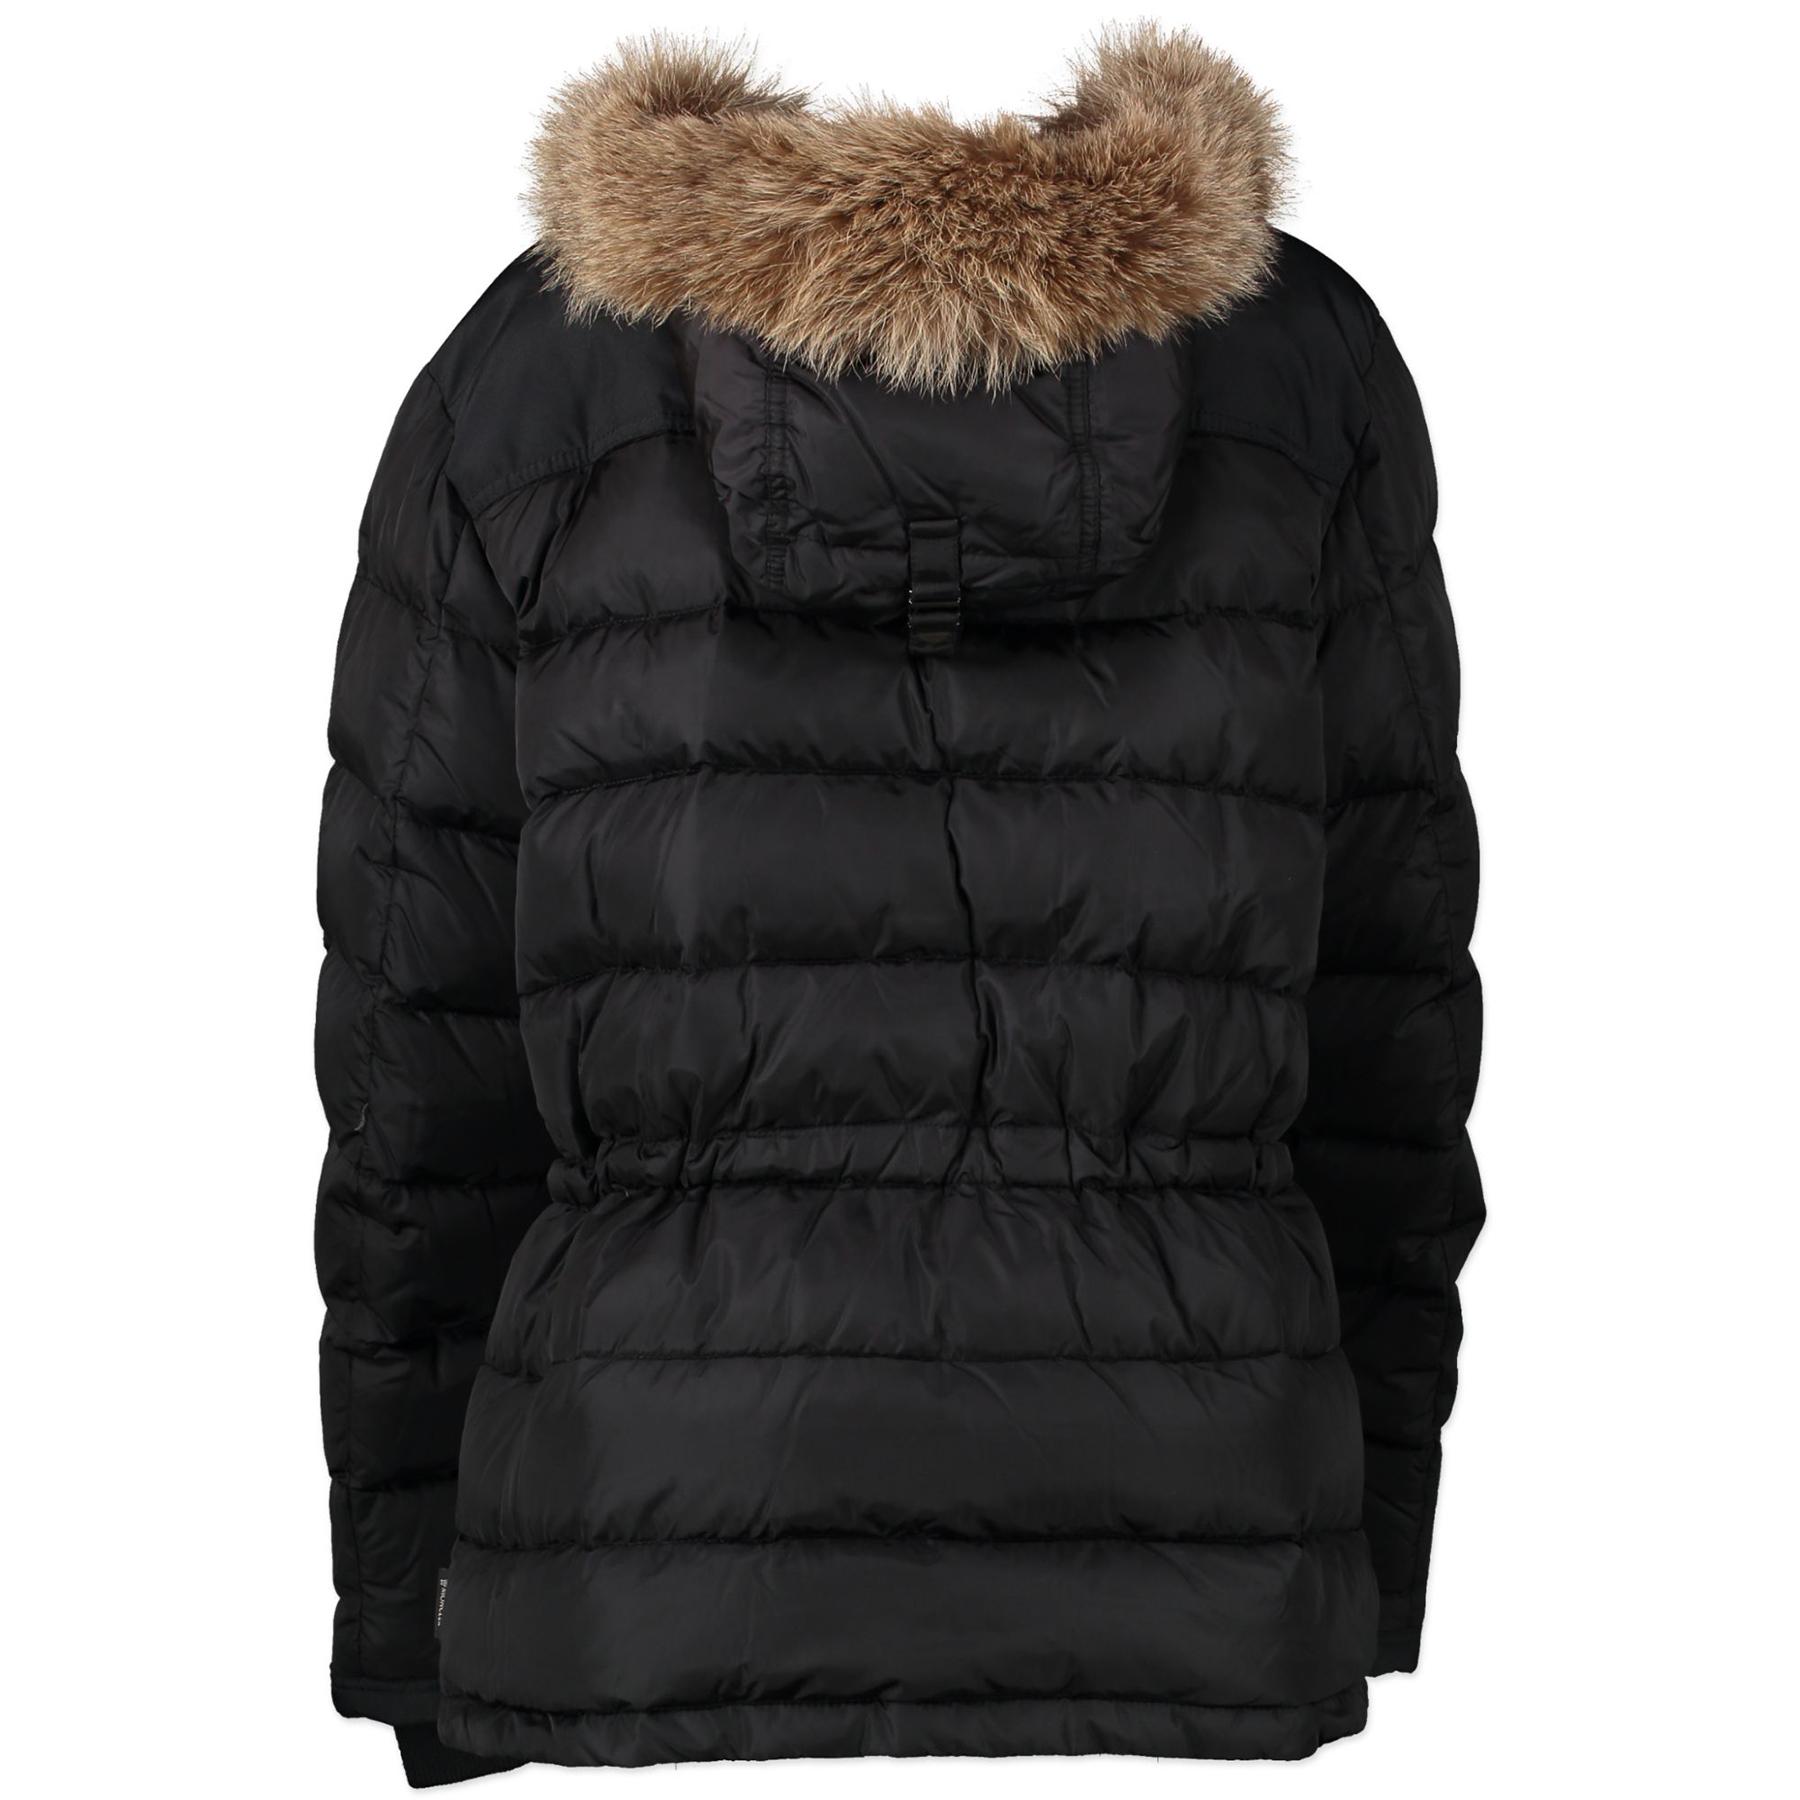 shop safe online Moncler Black Duffel Coat - size 3